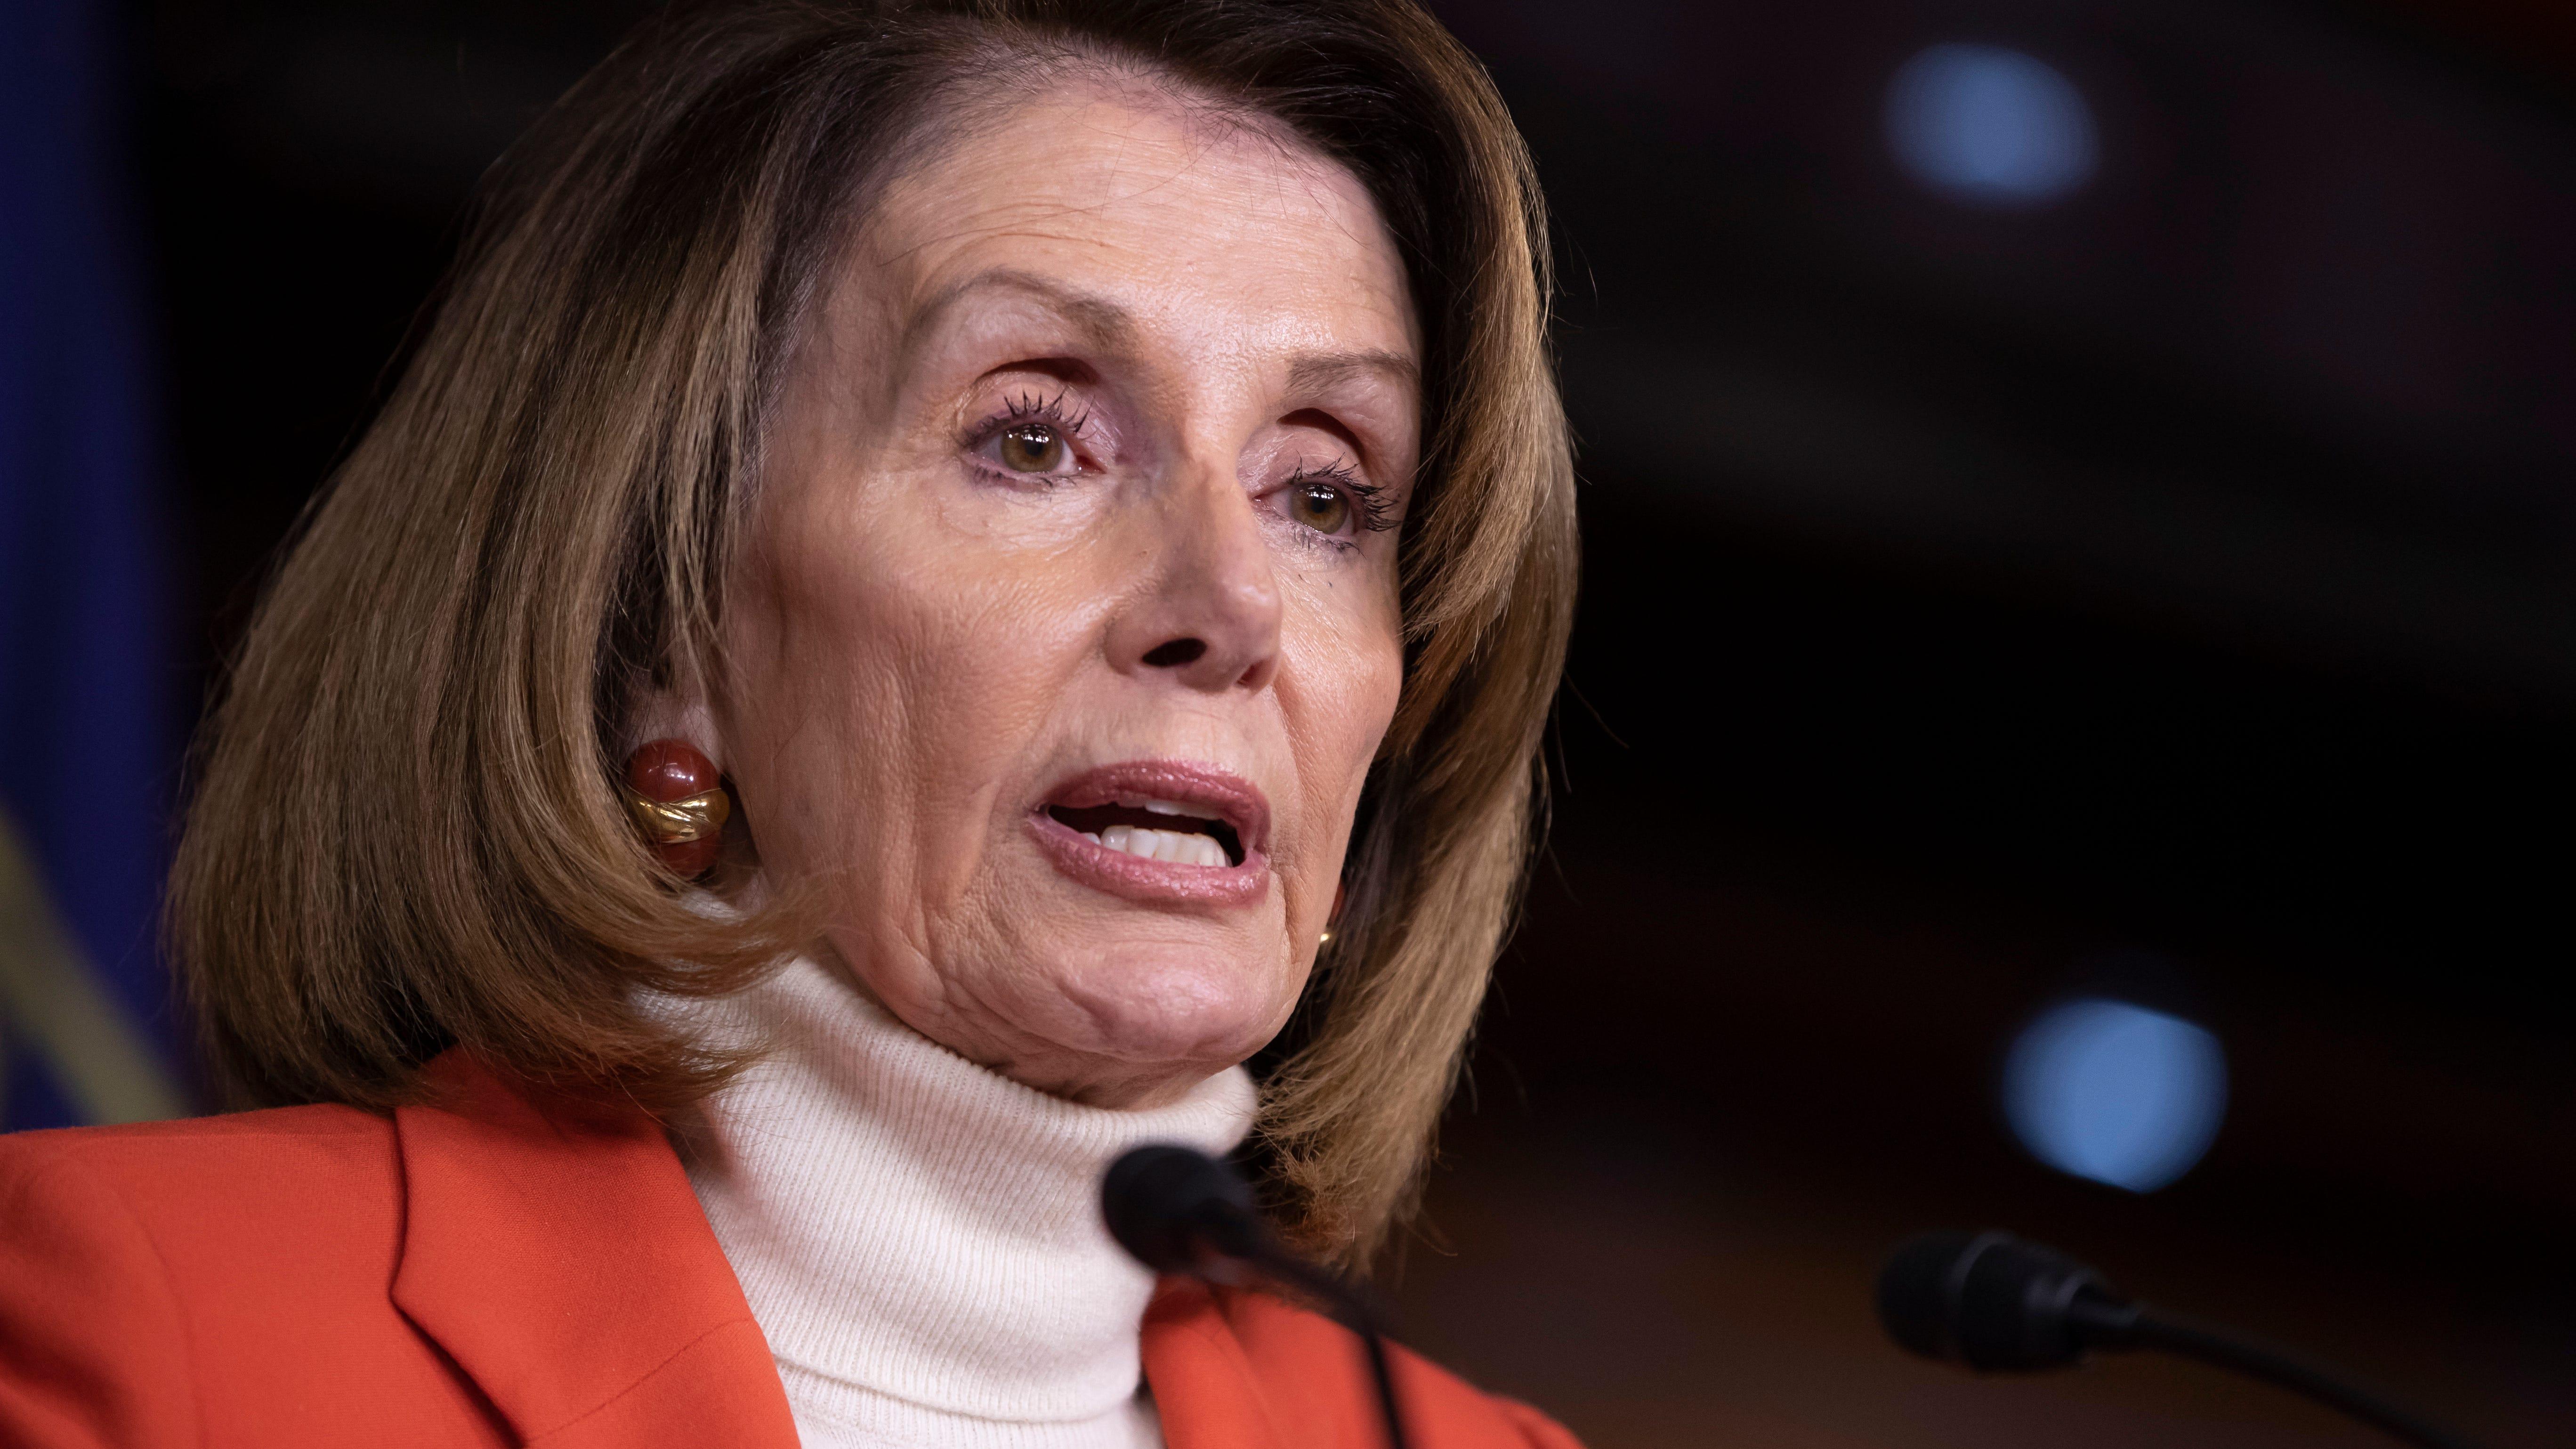 House Democratic leader Nancy Pelosi in Washington, D.C., on Nov. 15, 2018.